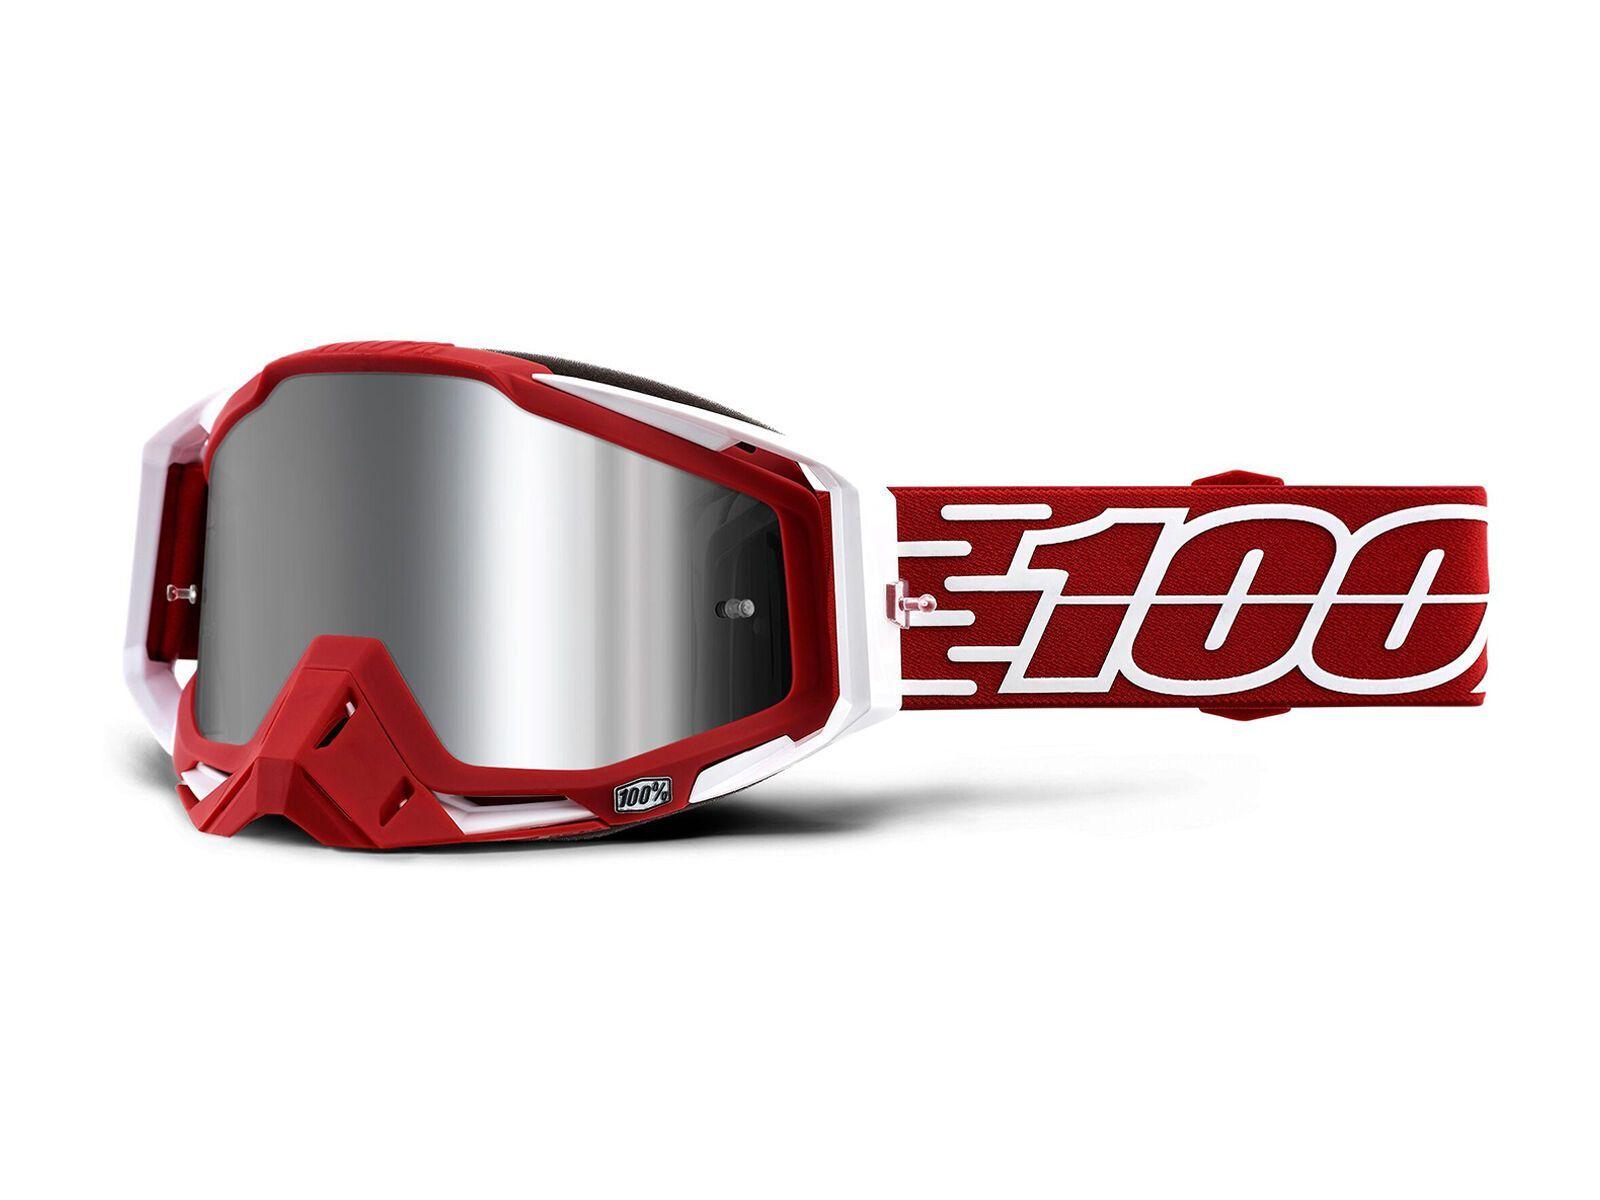 100% Racecraft Plus - Silver Flash Mirror gustavia HU-GOG-0012-unis-1168-Gustavia